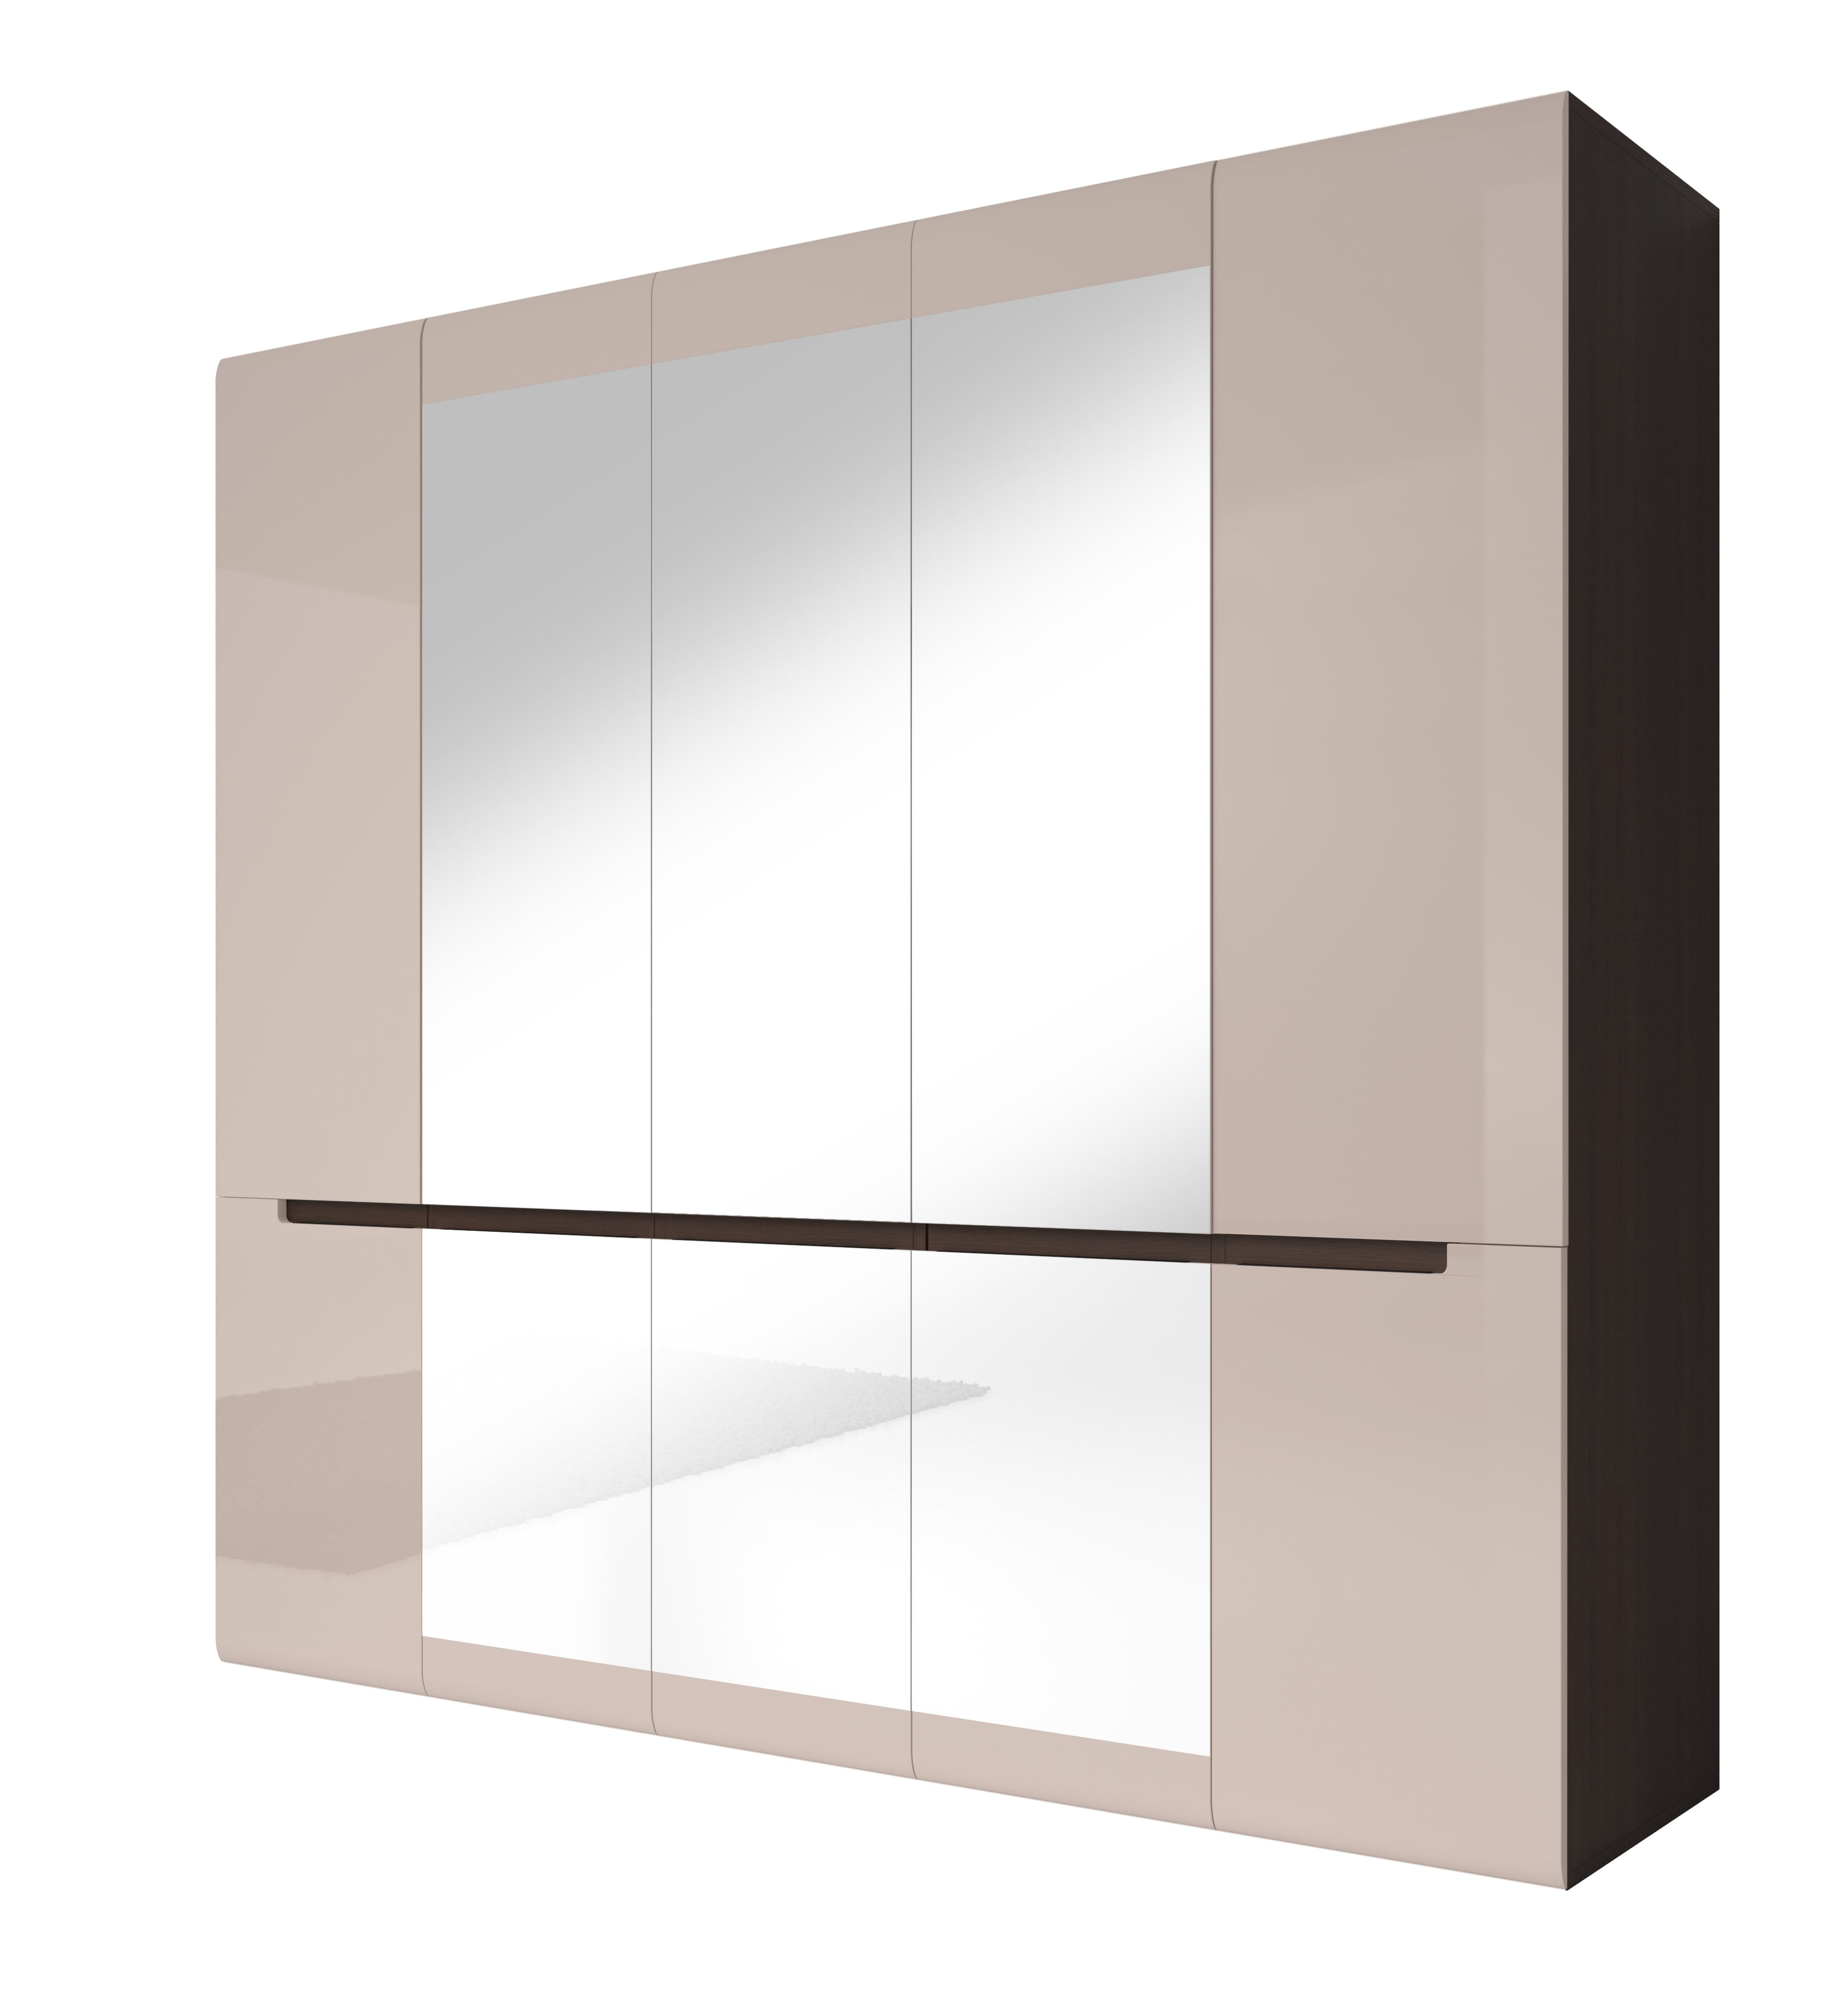 Šatní skříň - Hayle - Typ 21 (dub sonoma tmavá + šedý pískový lesk)